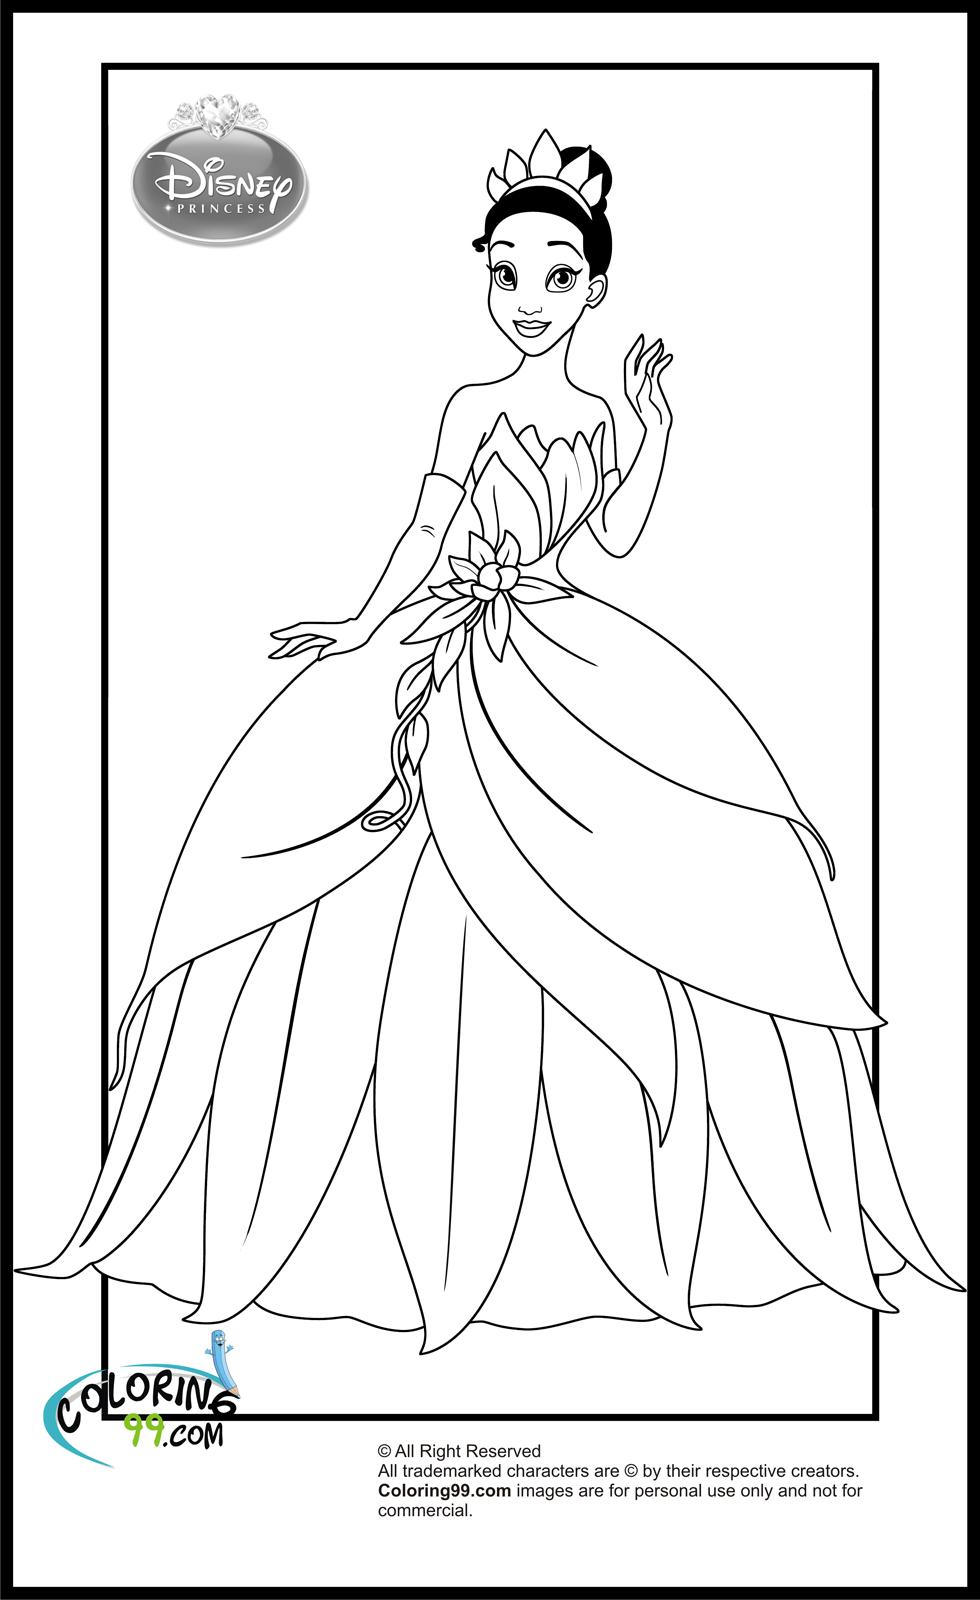 princess coloring page disney princess coloring pages minister coloring page princess coloring